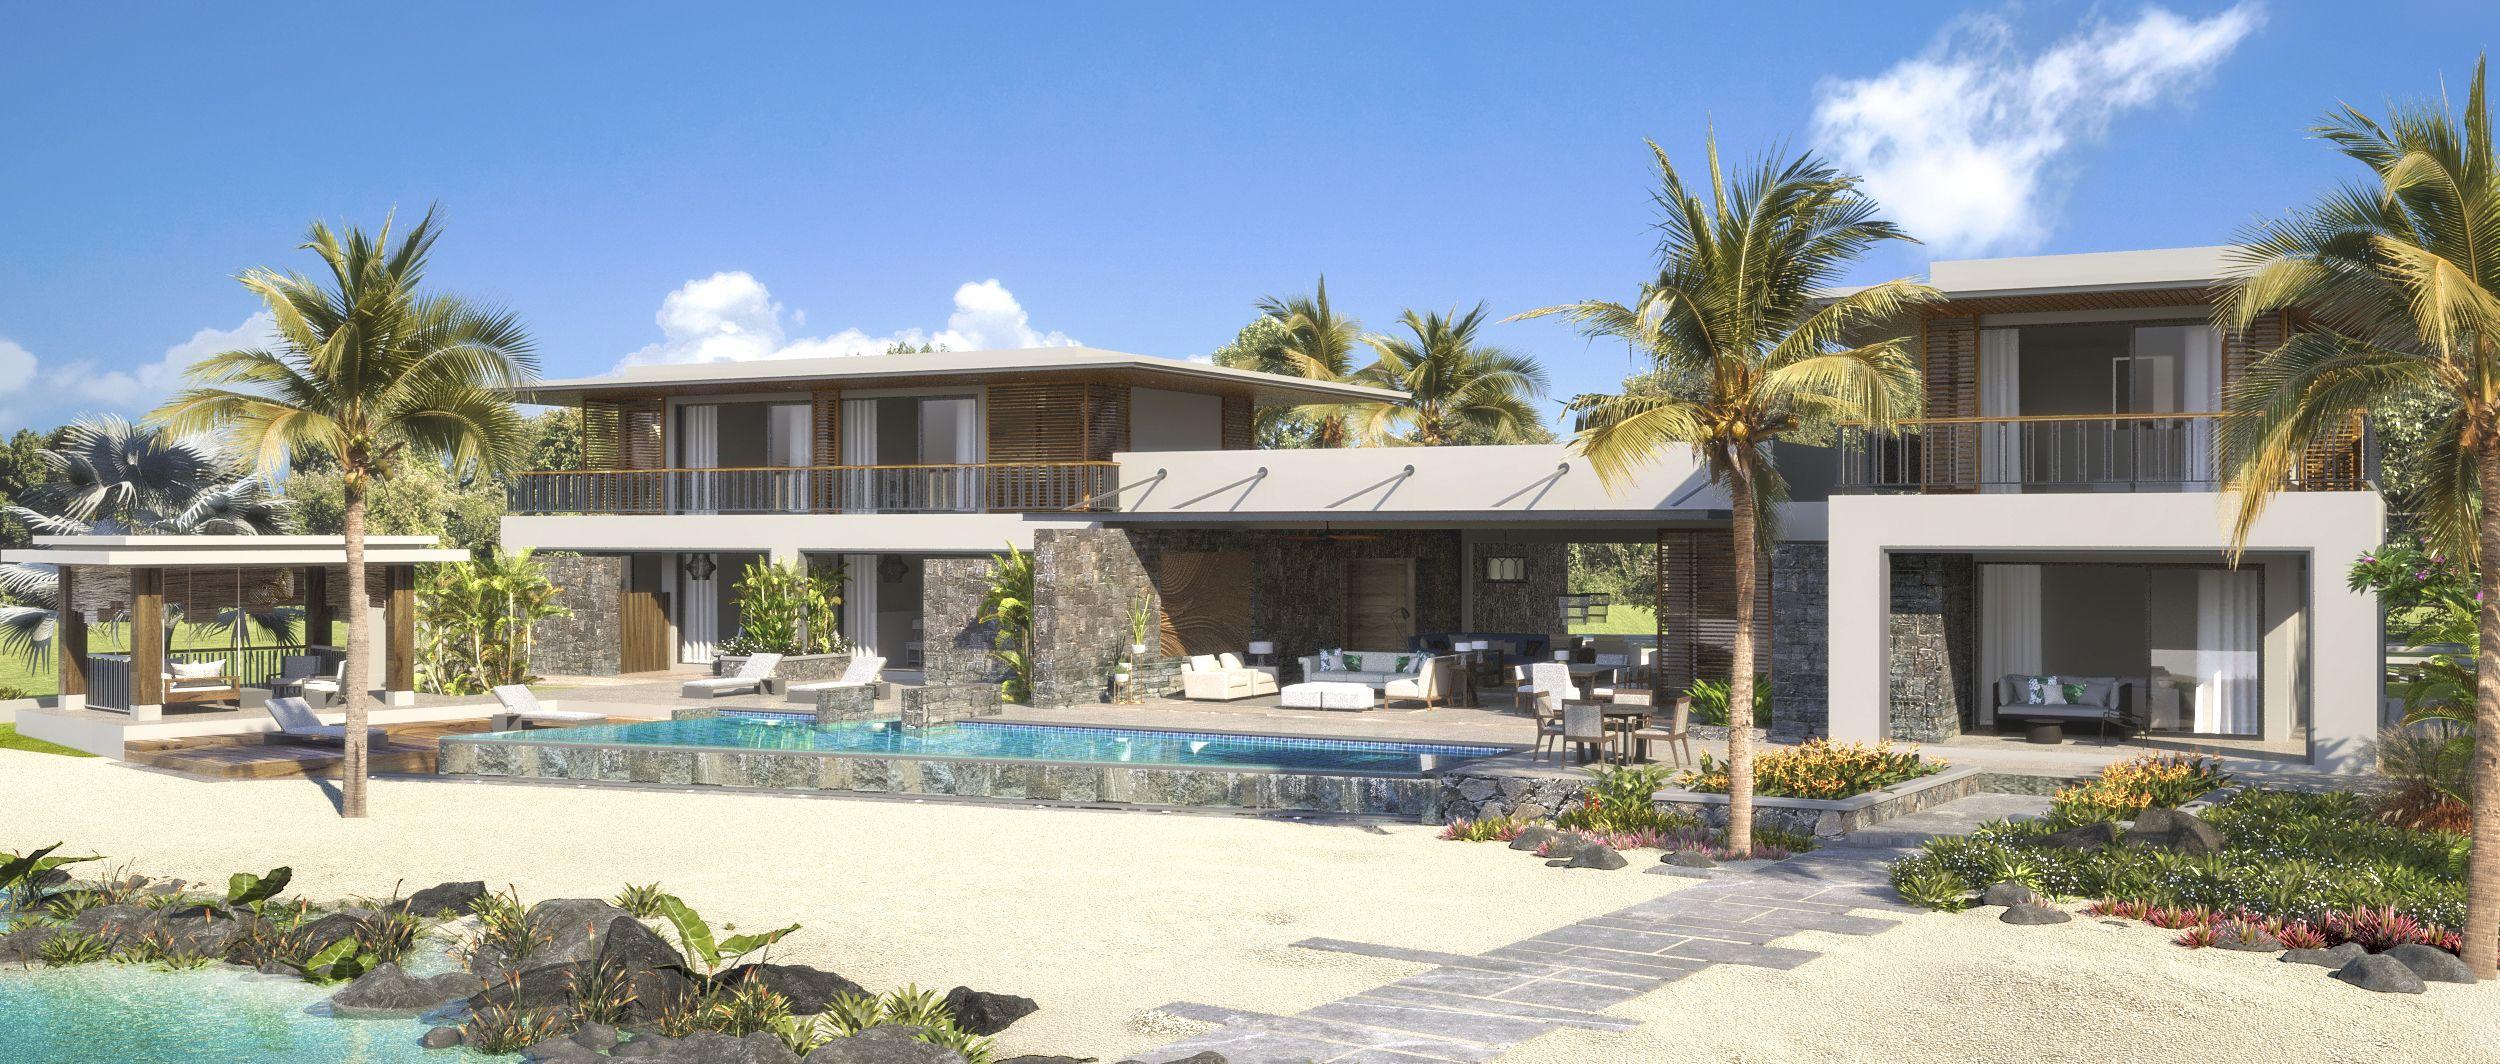 villa premium front view